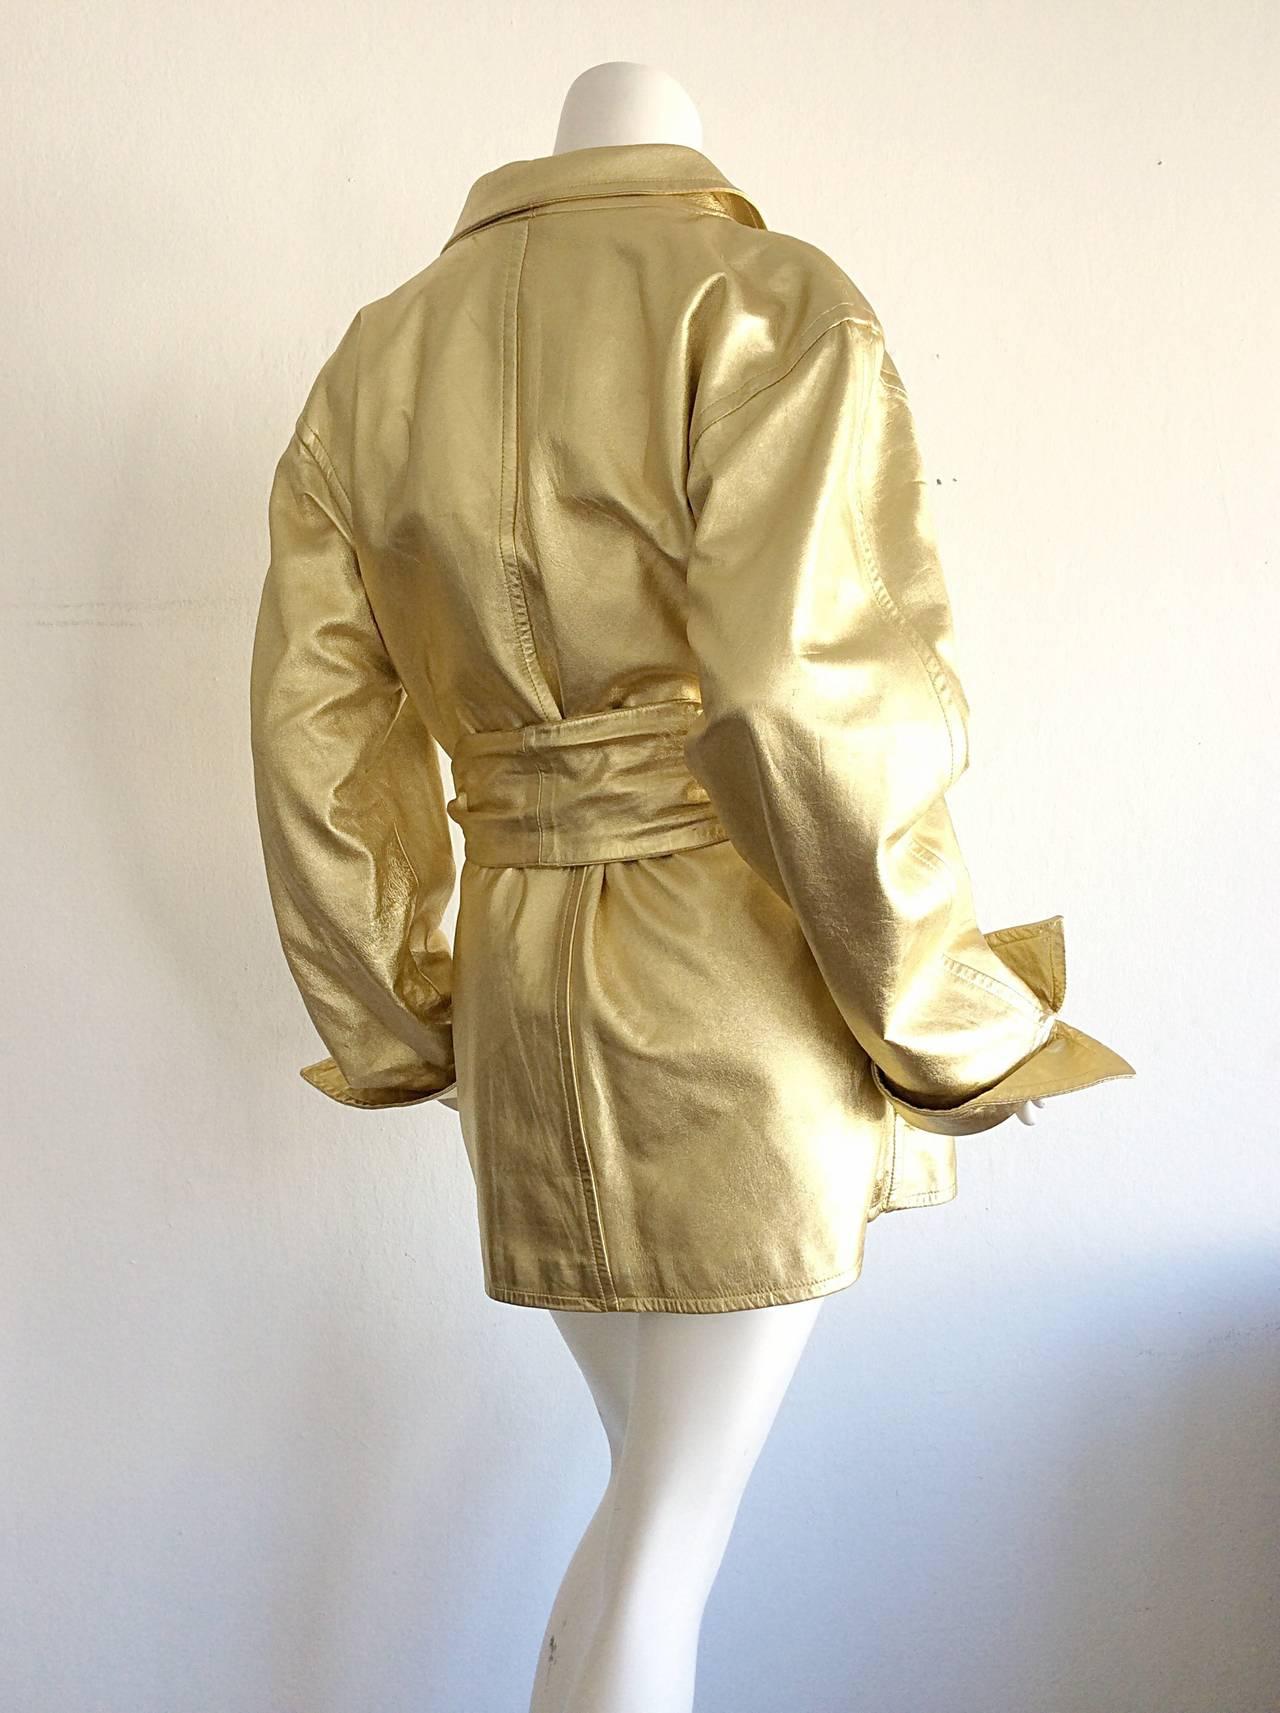 Vintage Yves Saint Laurent ' Rive Gauche ' Belted Gold Leather Jacket 9